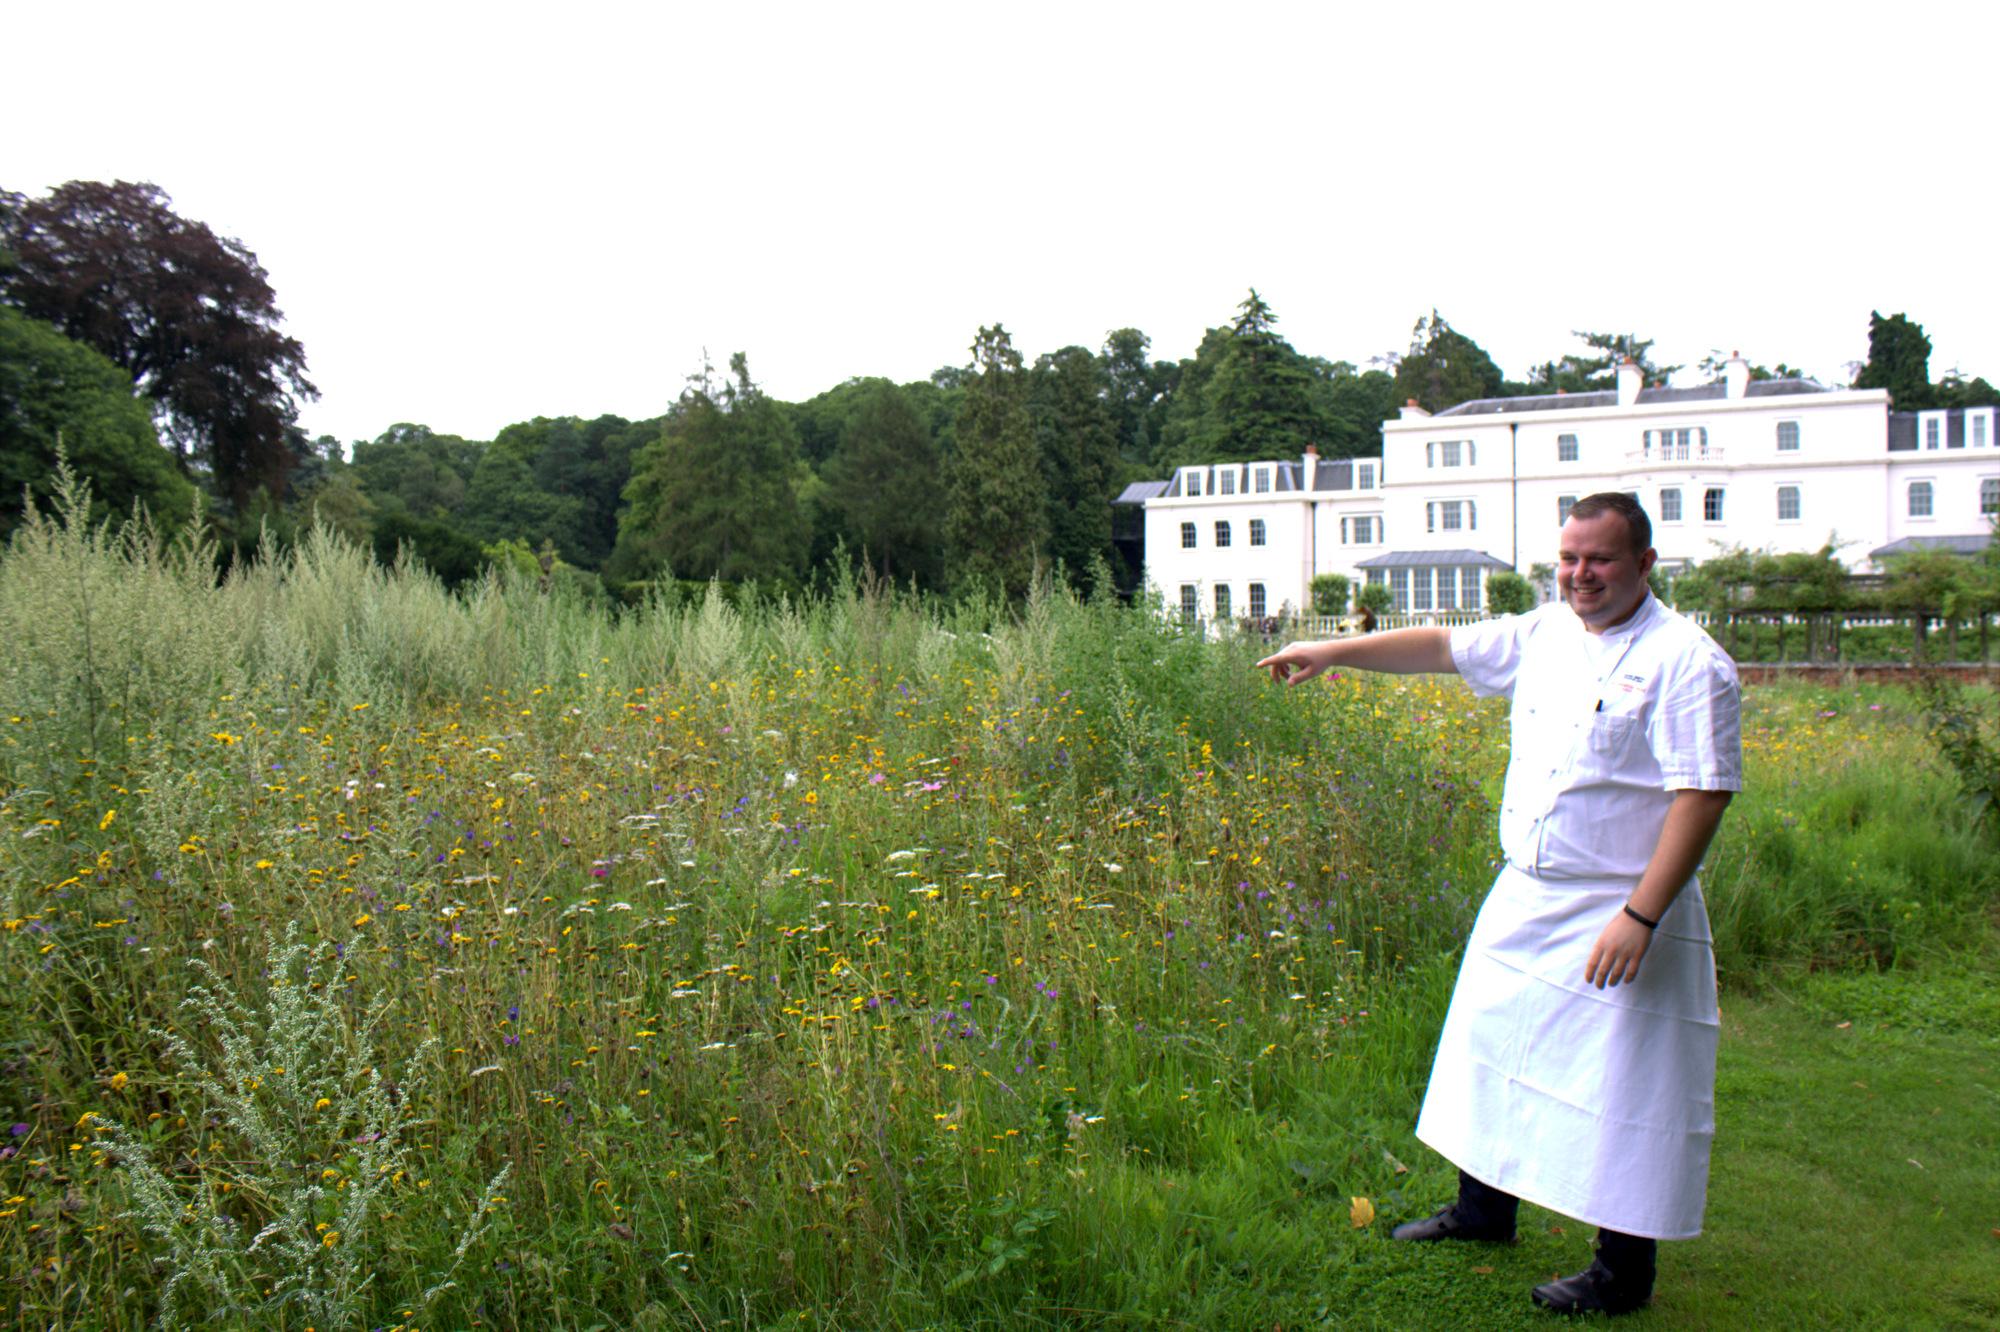 adam smith chef coworth park